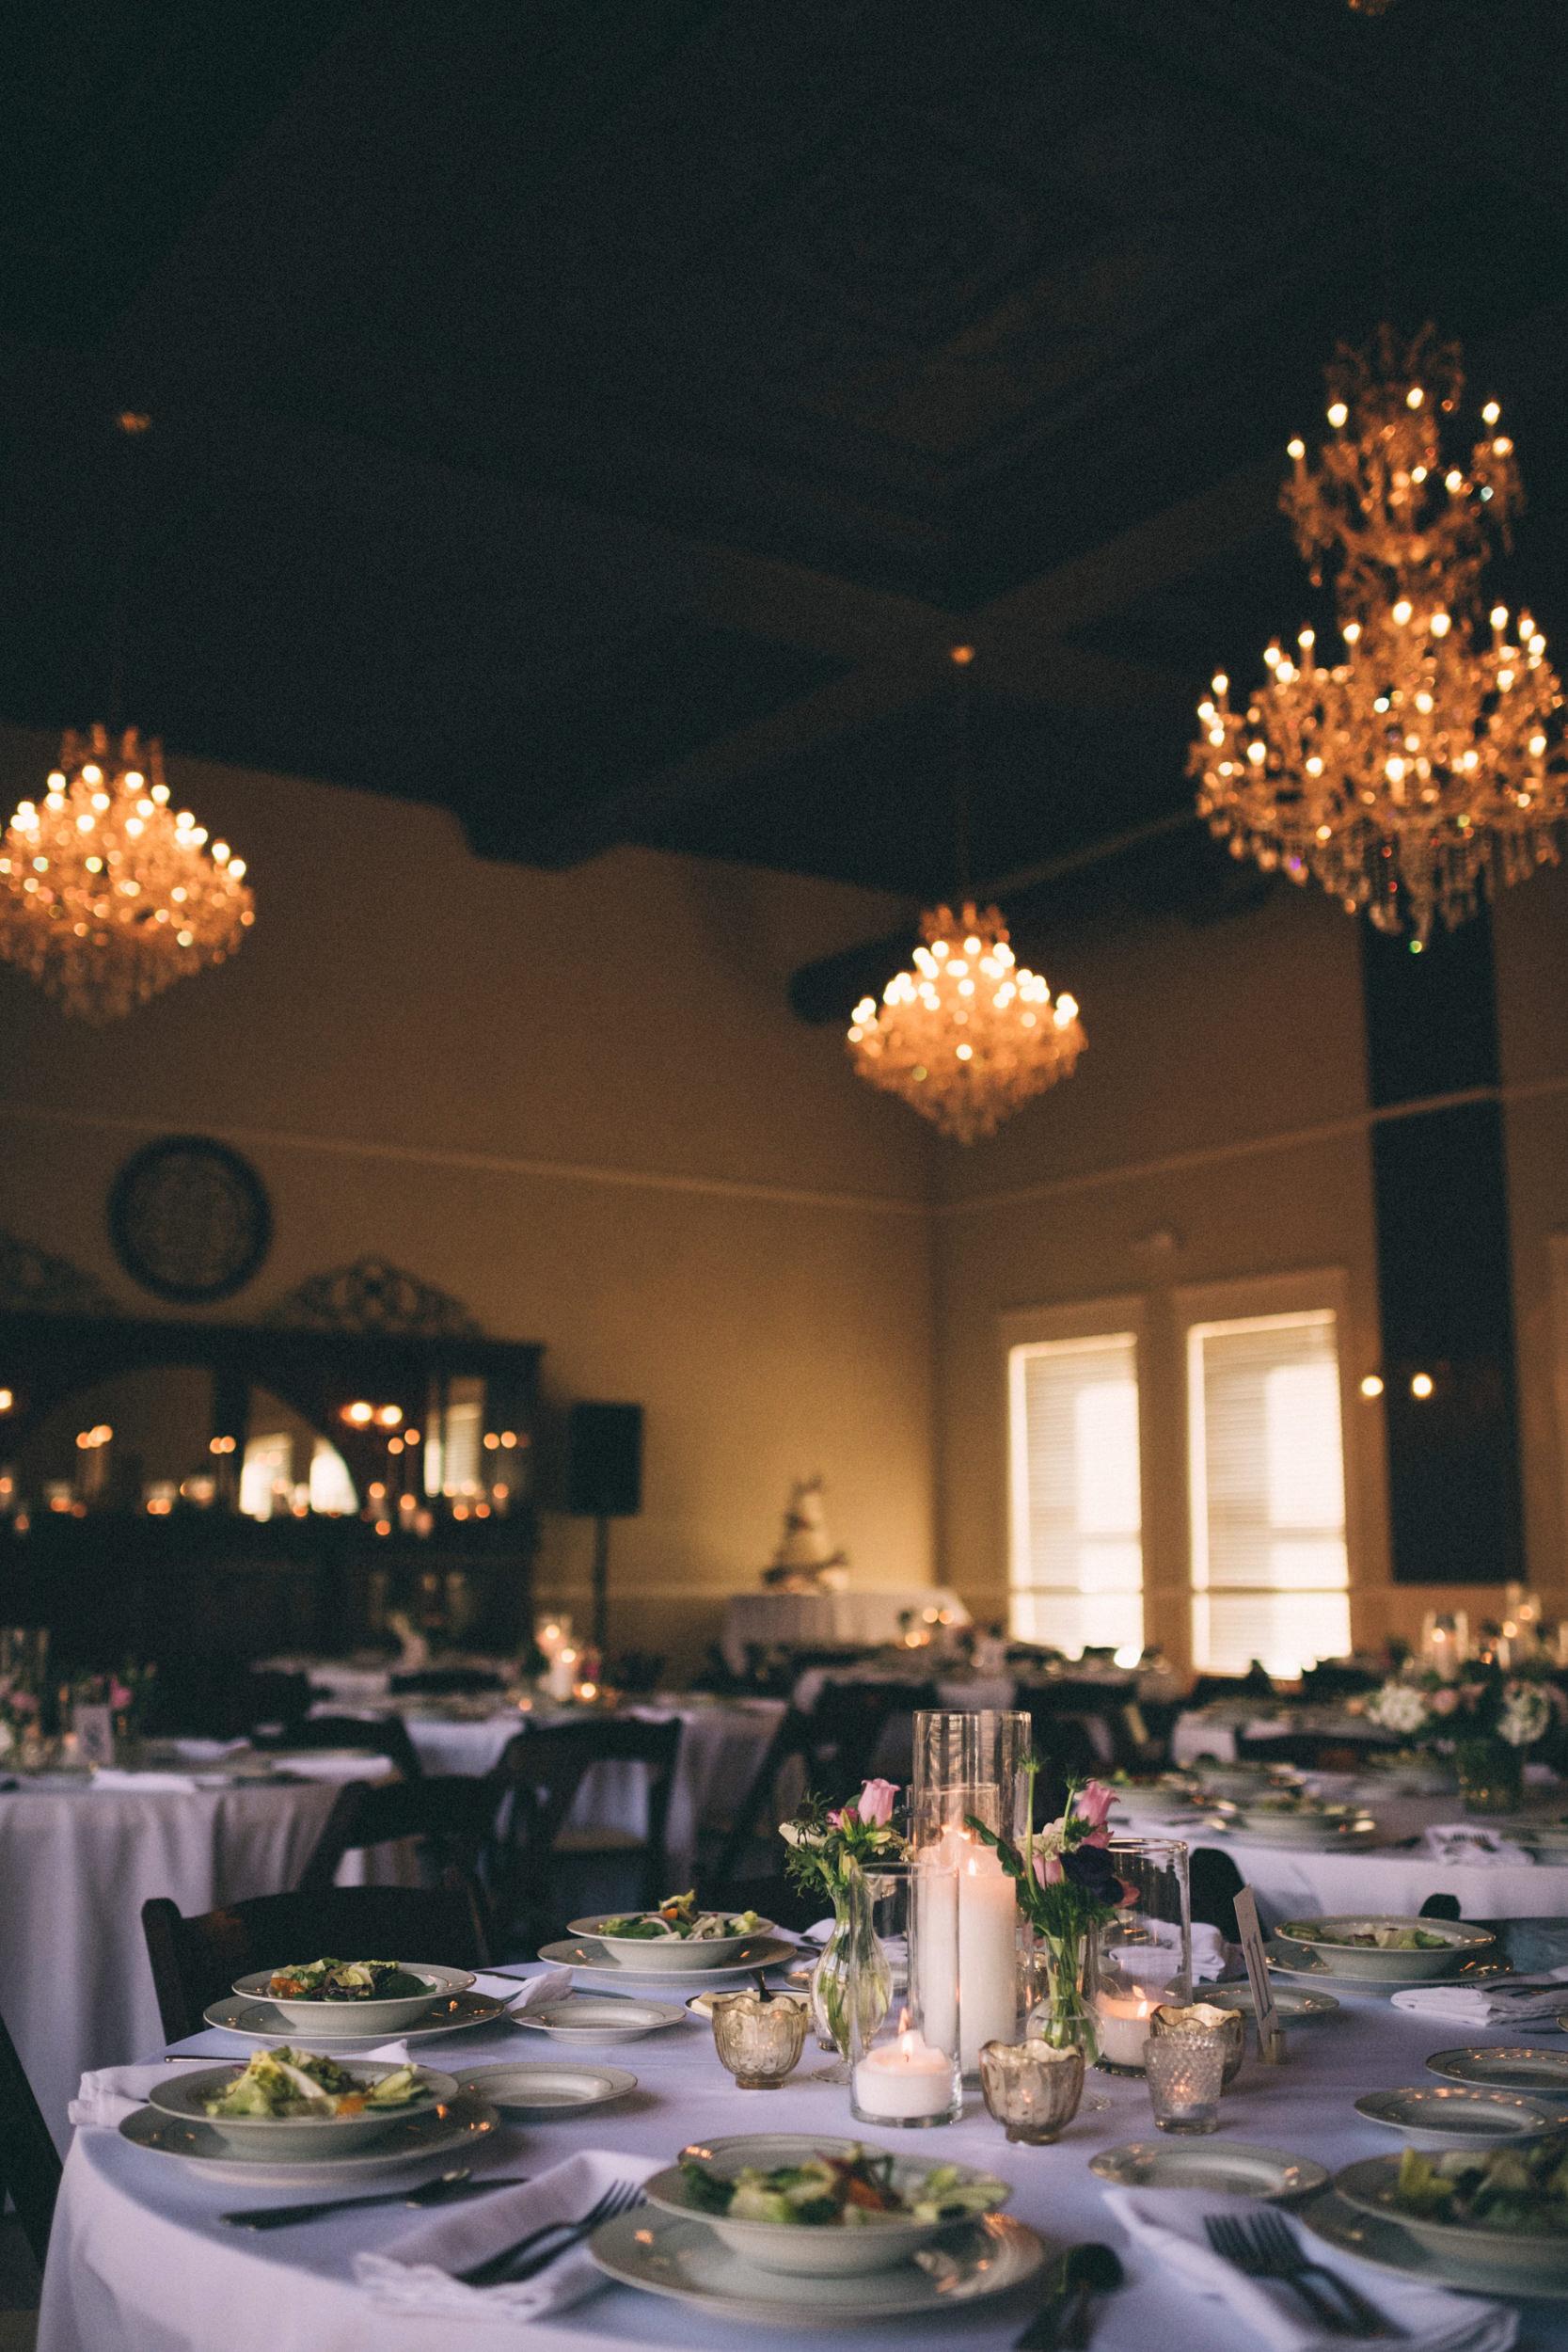 lauren-dean-wedding-grand-lodge-kentucky-sarah-katherine-davis-photography-464edit.jpg